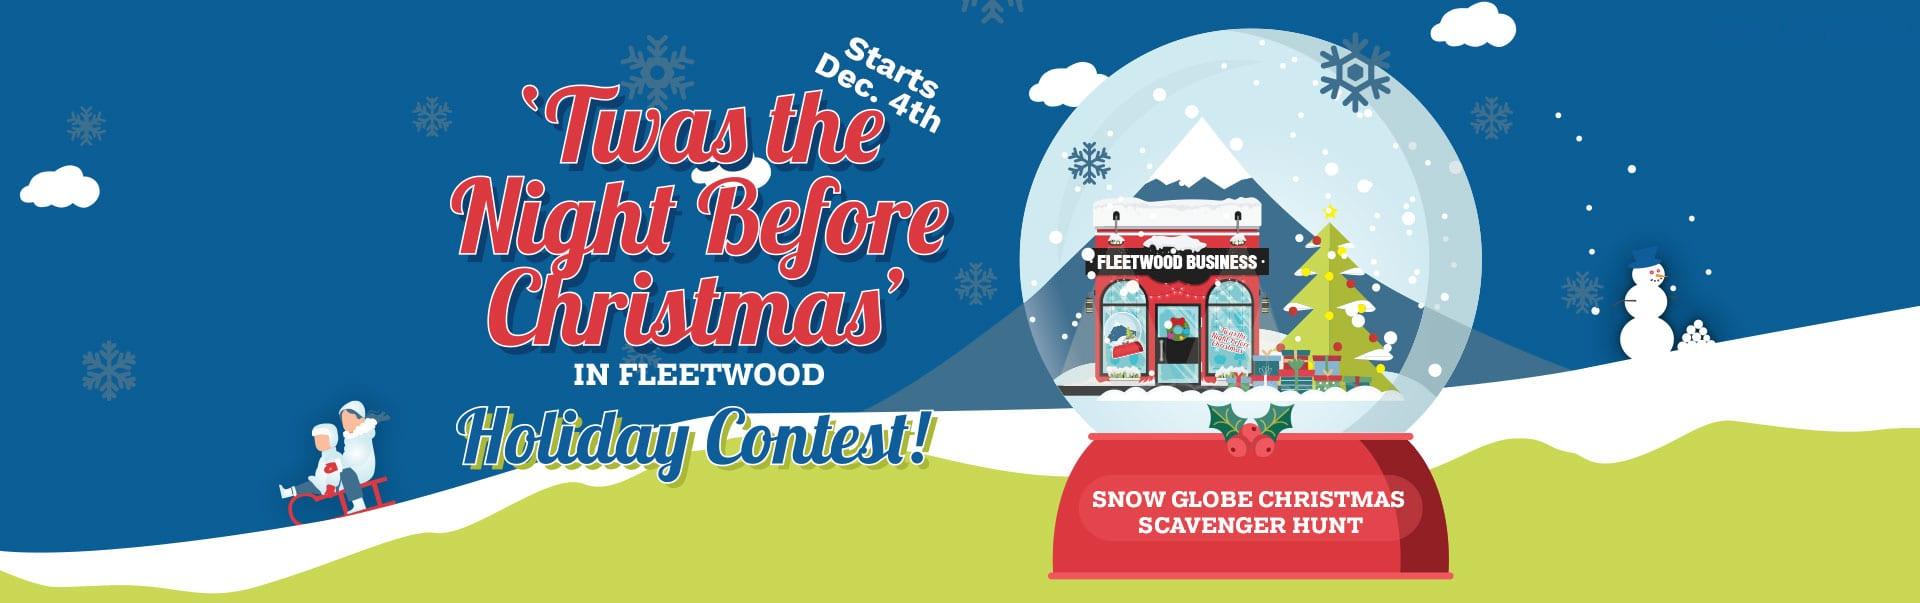 Snow-Globe-Contest-Fleetwood-2020-Banner